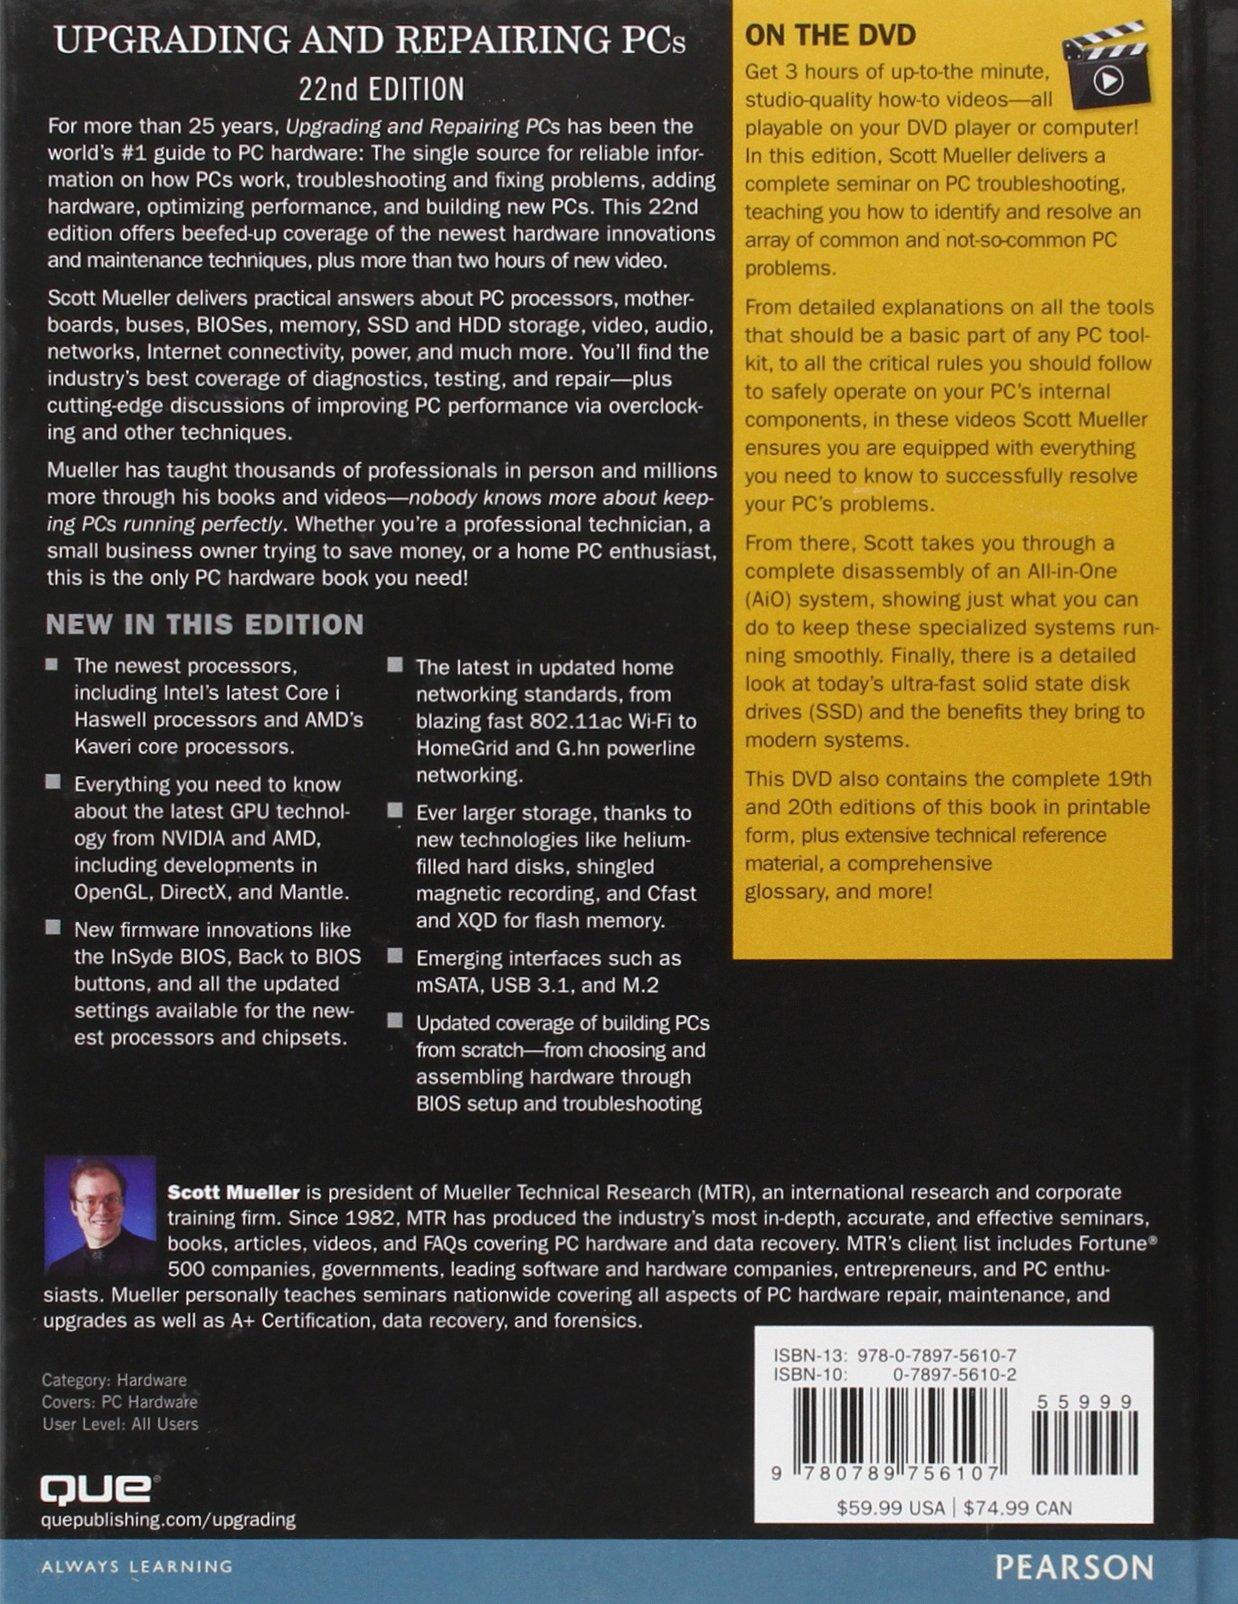 Upgrading and Repairing PCs: Amazon.co.uk: Scott Mueller: 9780789756107:  Books